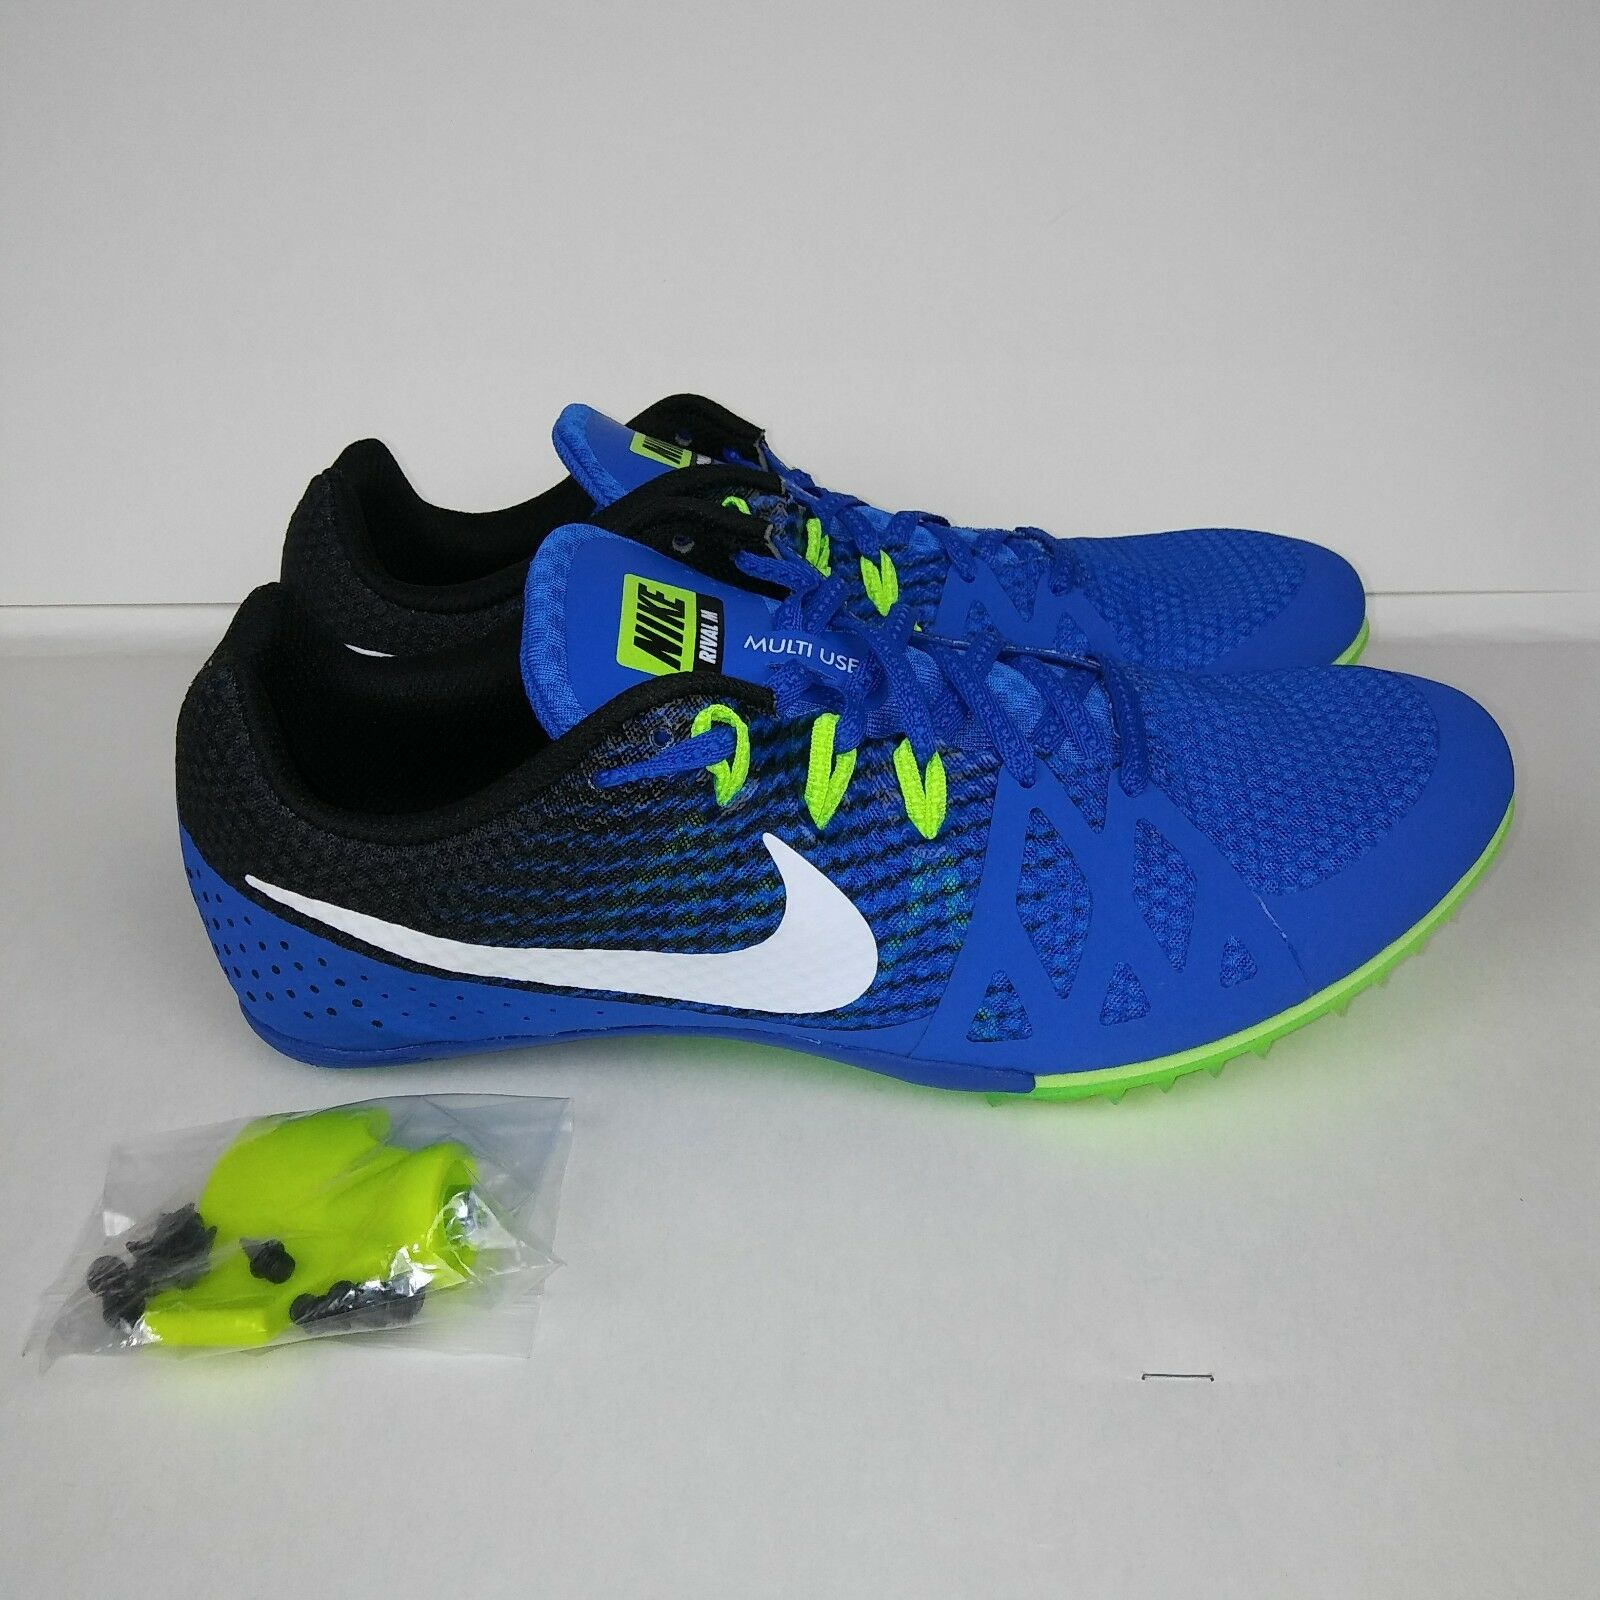 NIKE Zoom Rival M Track Bleu Racing Running Spikes Chaussures Bleu Track vert Hommes ec1cc2